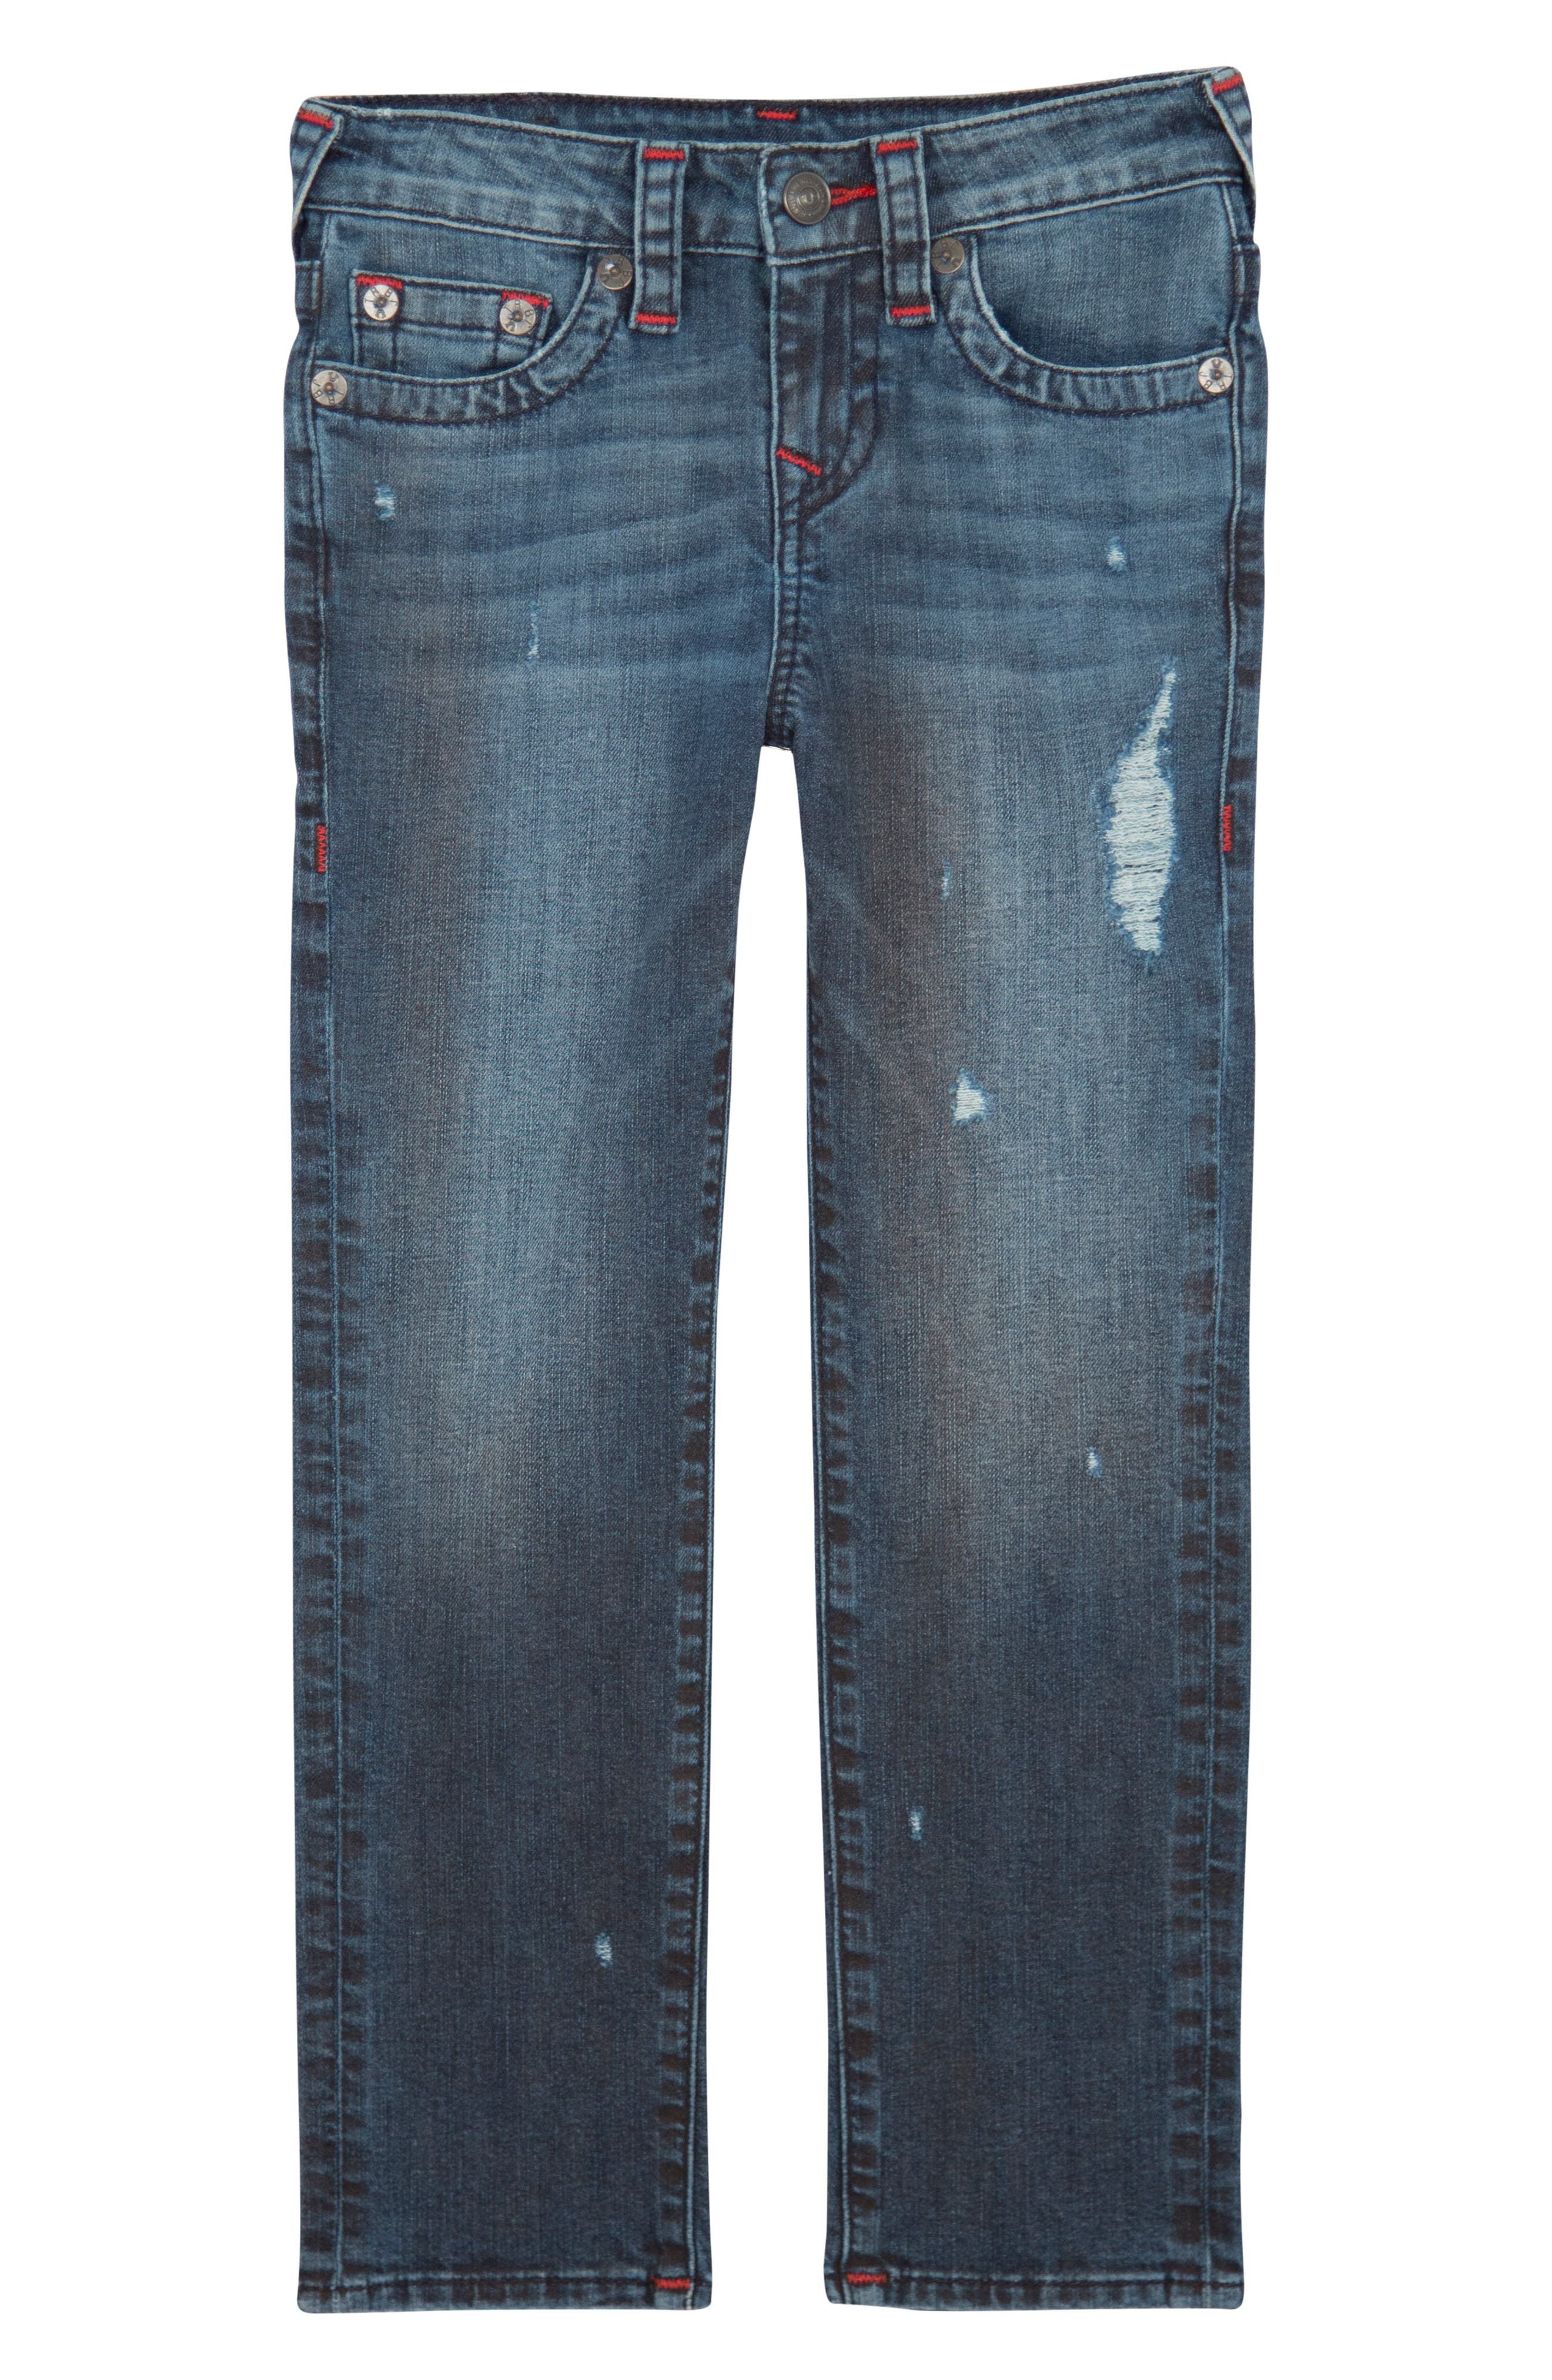 Boys True Religion Brand Jeans Geno Straight Leg Jeans